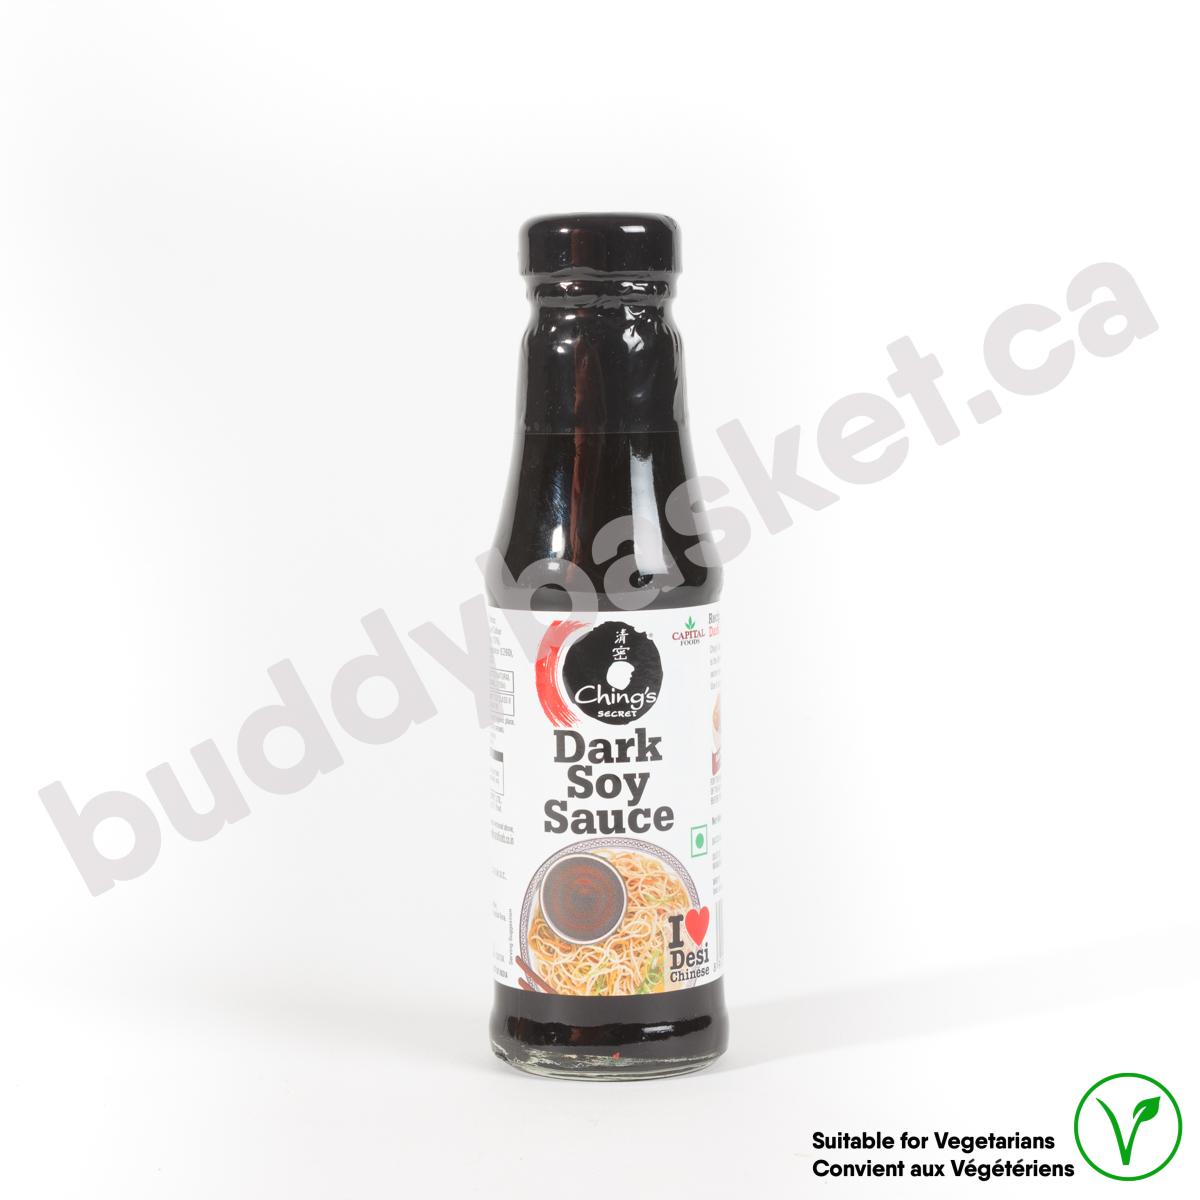 Ching's Dark Soy Sauce 210g